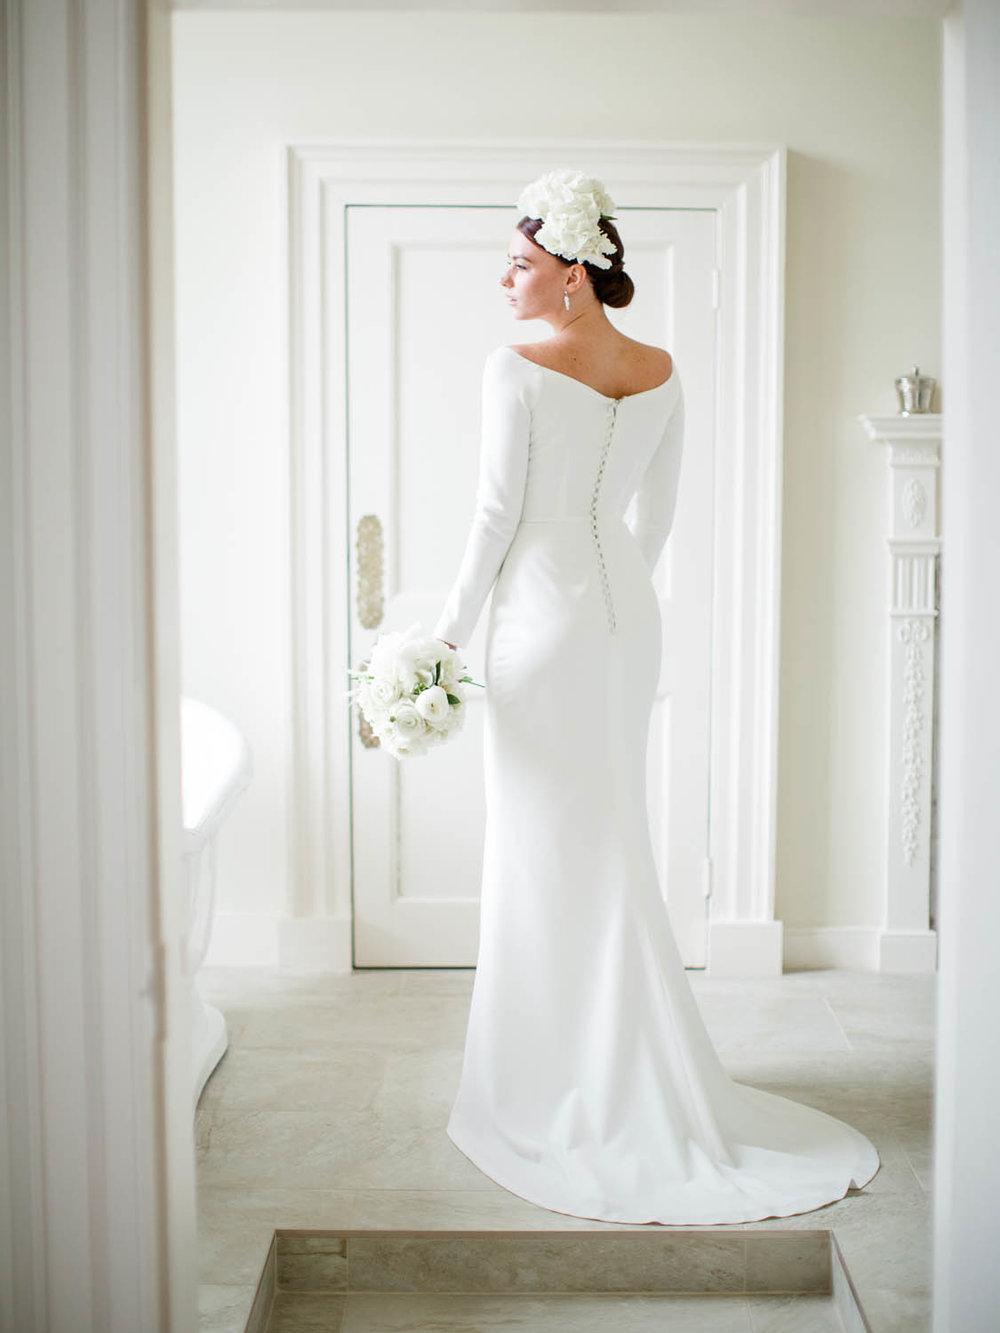 Amy O'Boyle Photography, Destination & UK Fine Art Film Wedding Photographer, Pynes House Wedding Devon-19.jpg